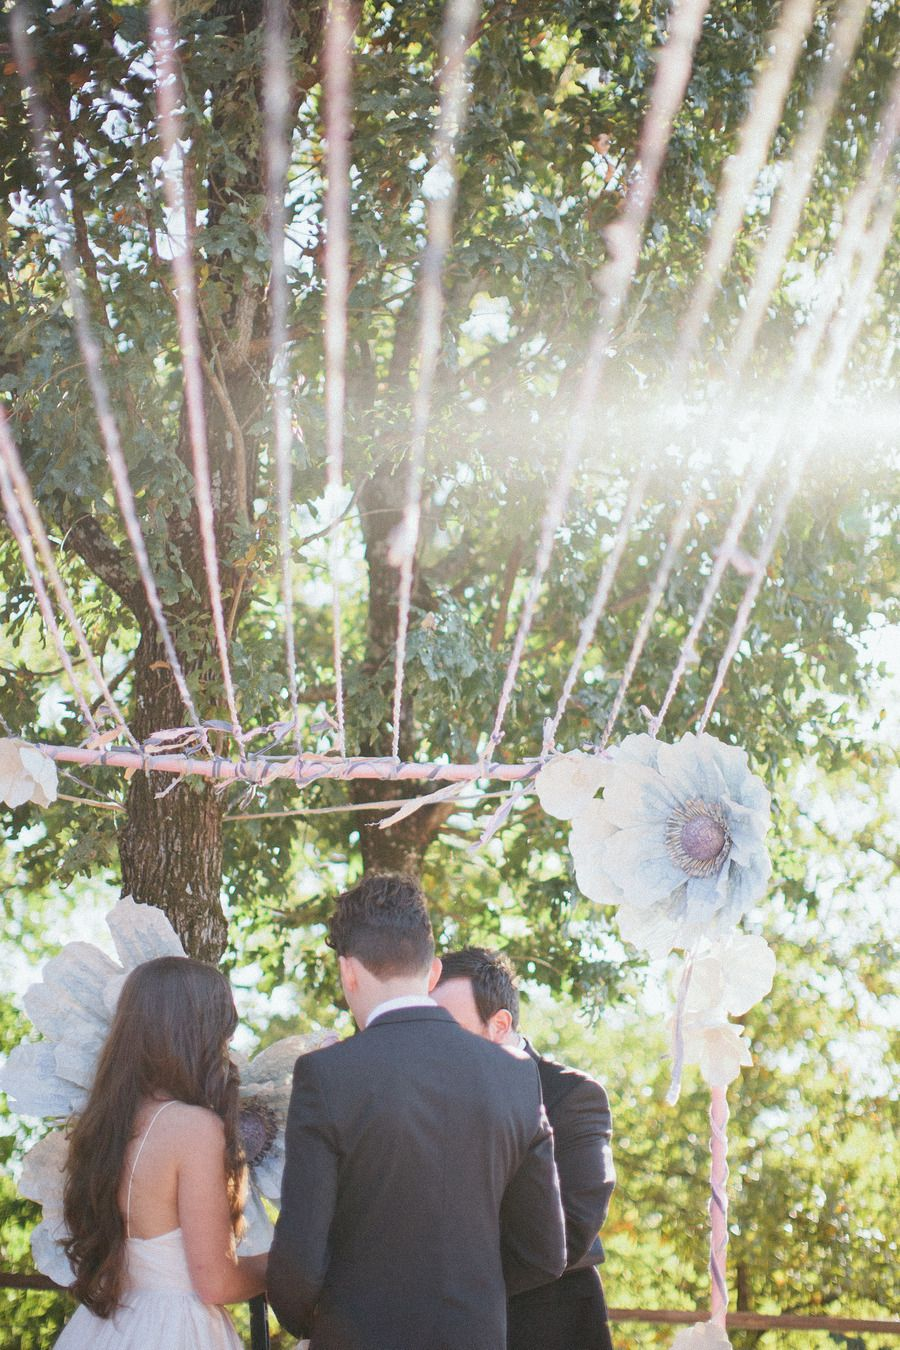 DIY Texas Wedding from Abi Q Photography  Read more - http://www.stylemepretty.com/texas-weddings/2013/09/10/diy-texas-wedding-from-abi-q-photography/